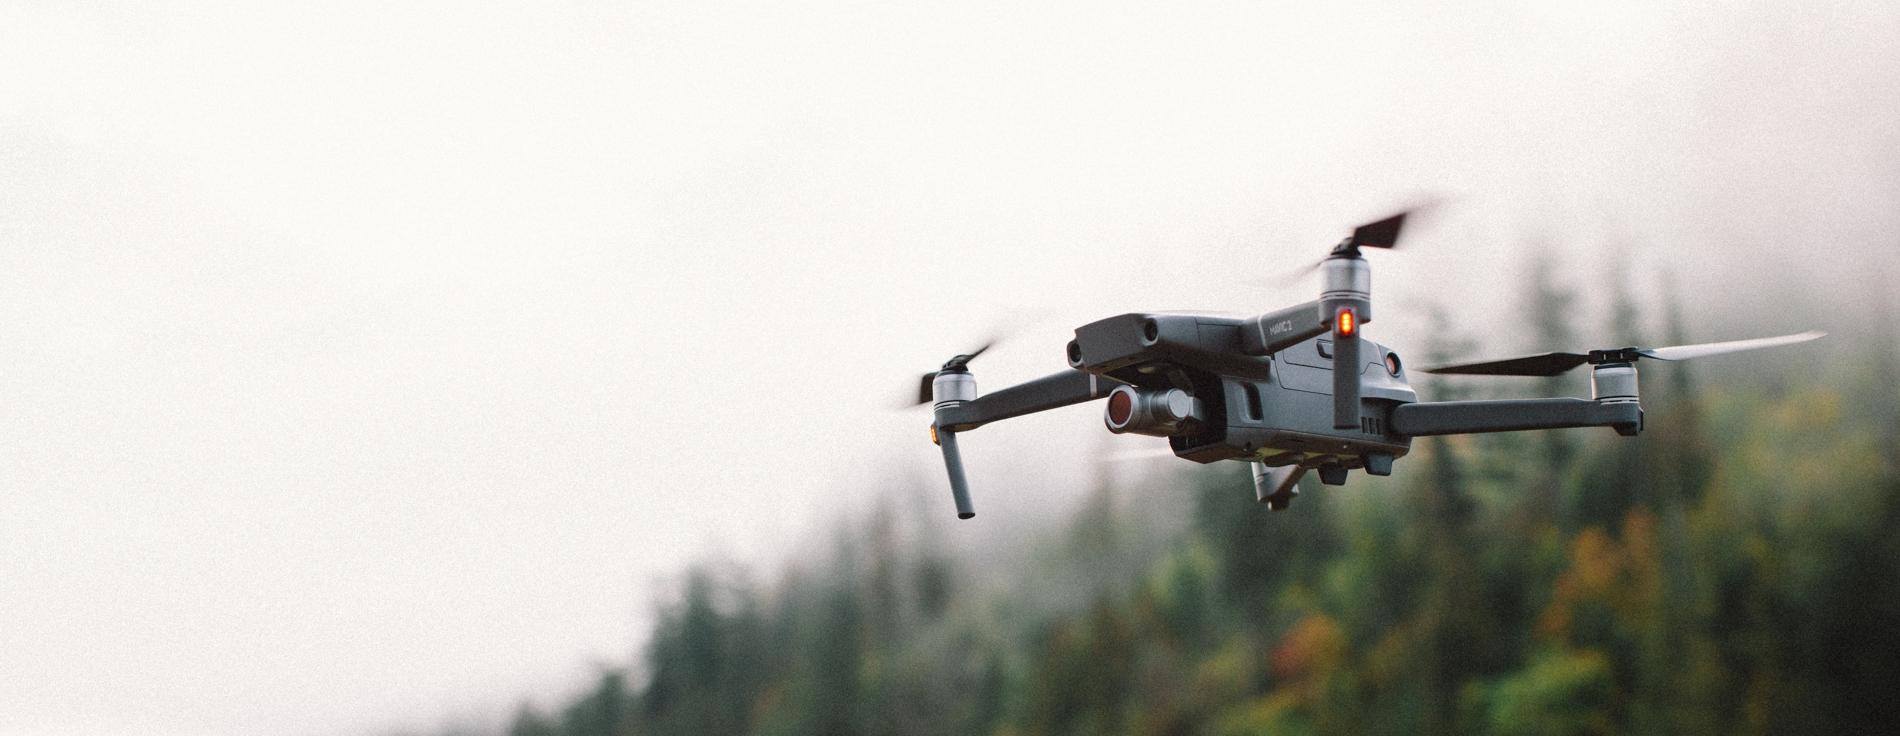 Drone-2.jpg